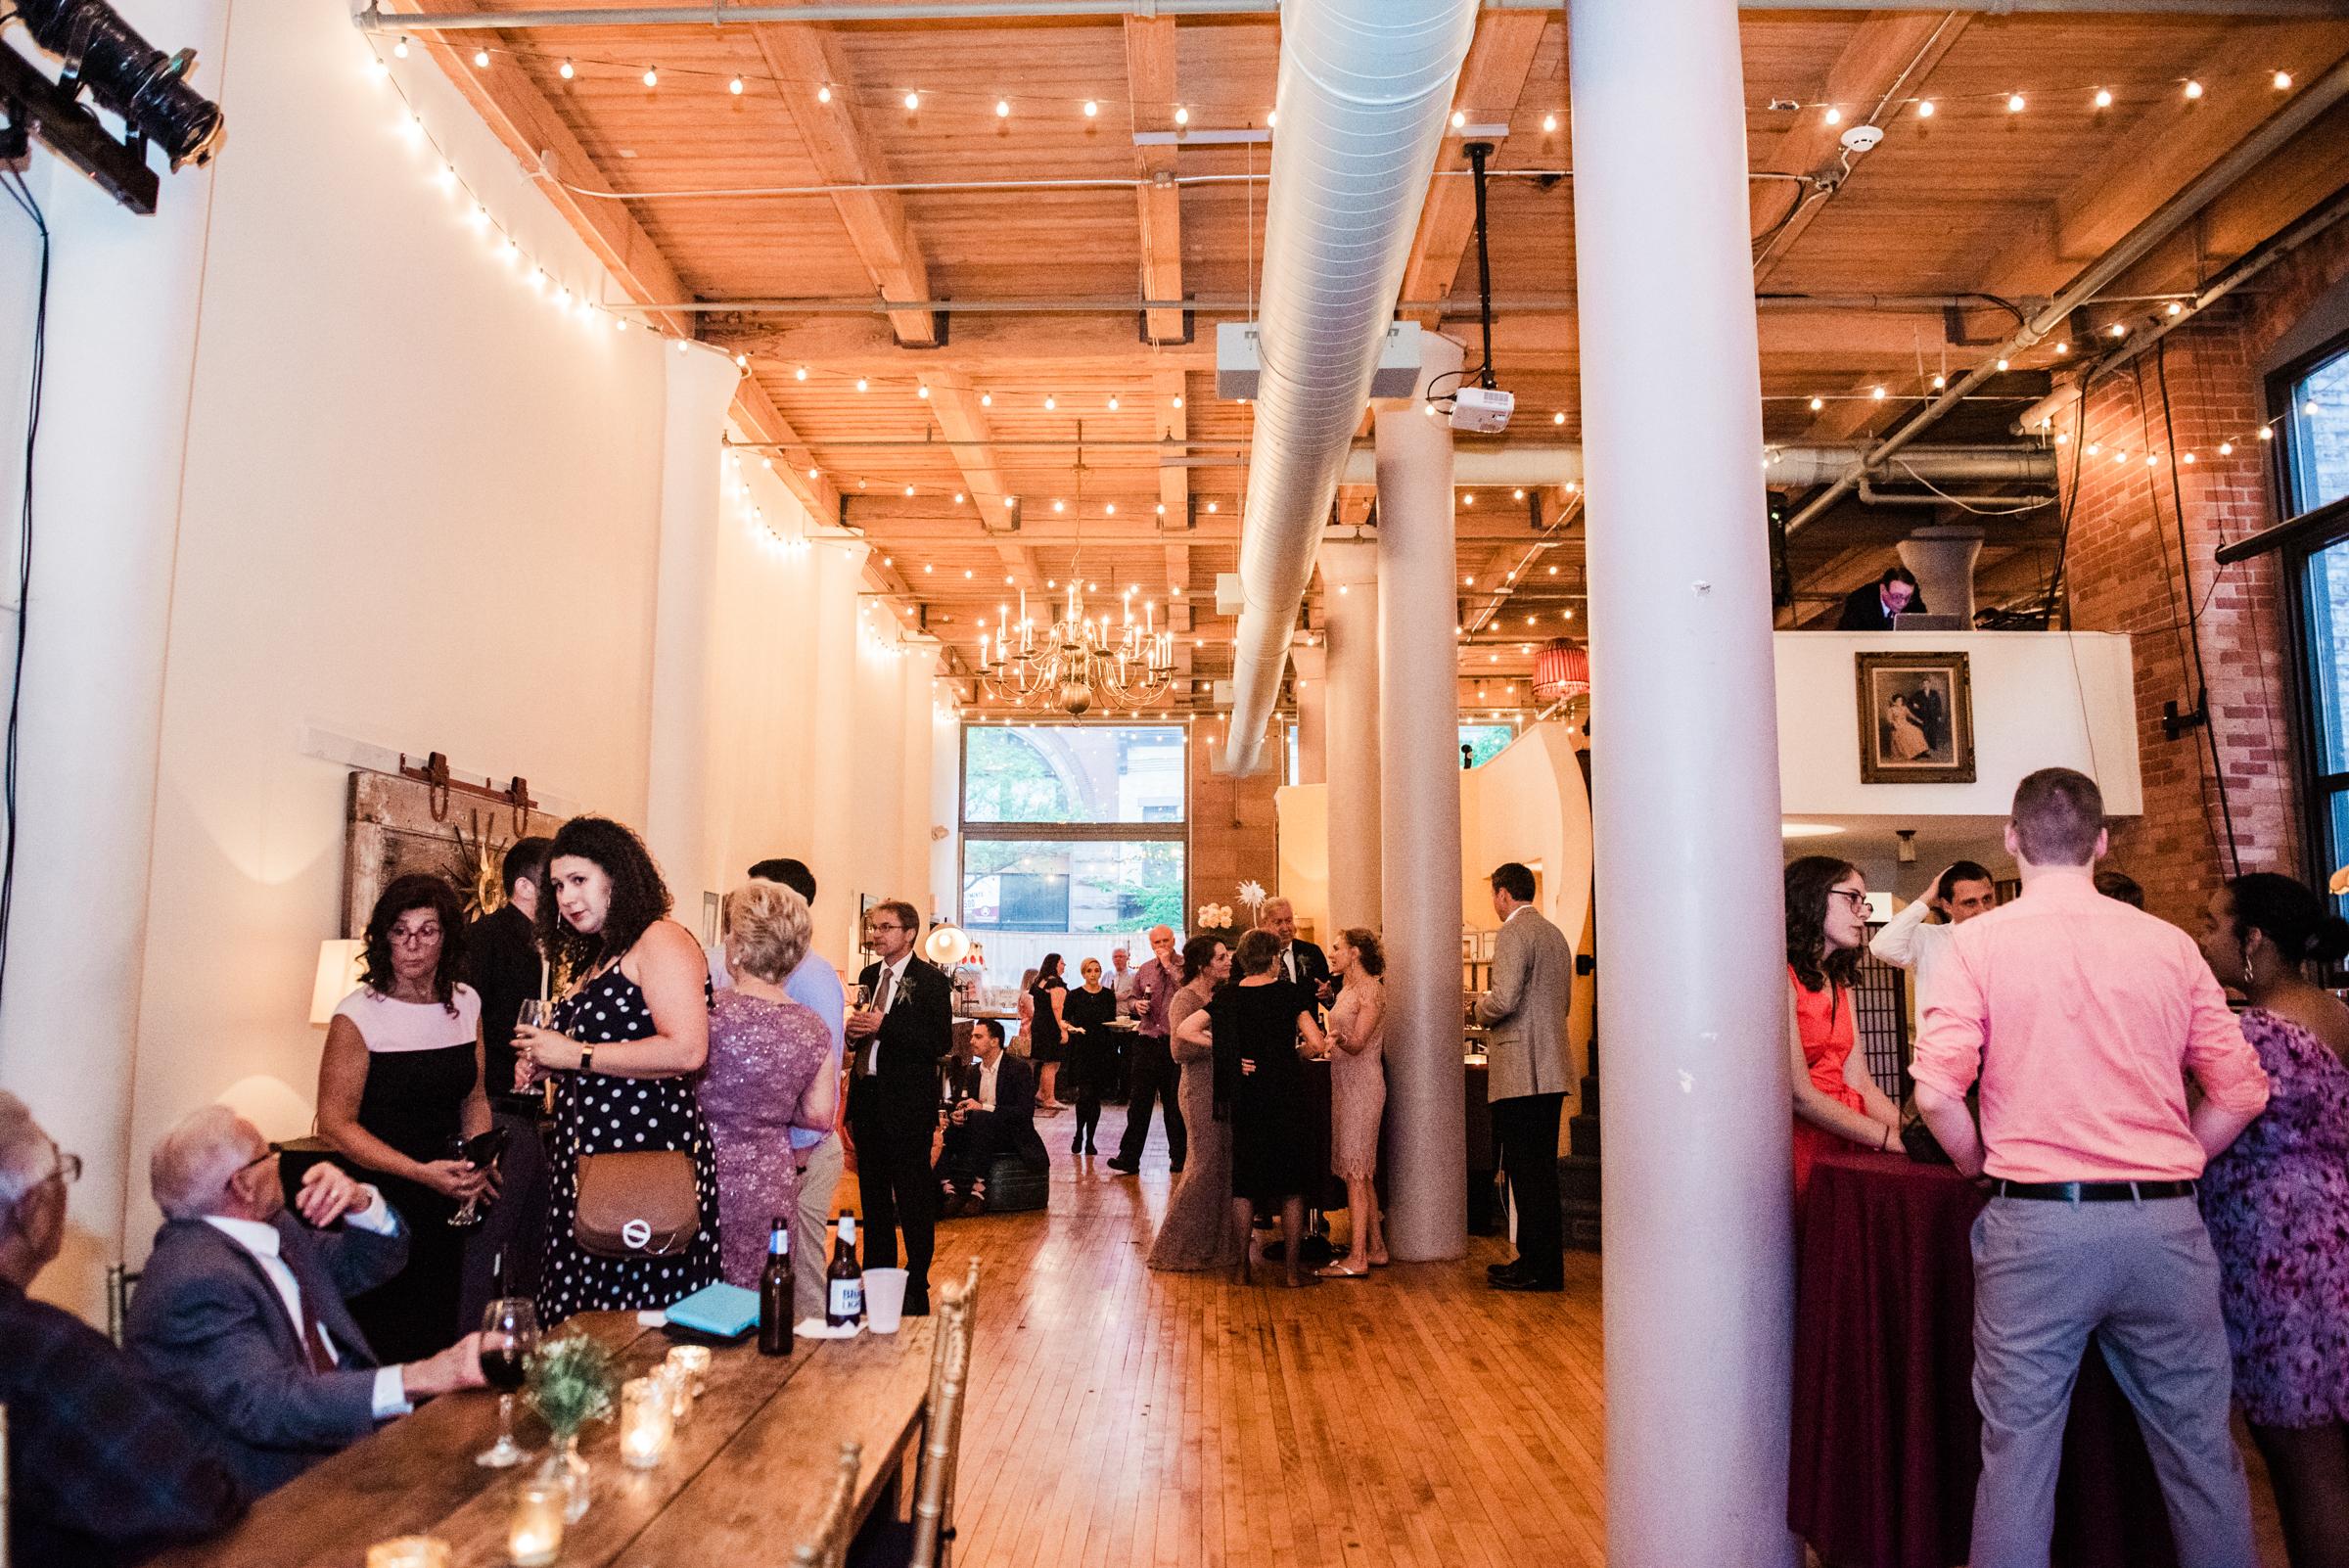 Studio_180_Lamberton_Conservatory_Rochester_Wedding_JILL_STUDIO_Rochester_NY_Photographer_DSC_9285.jpg